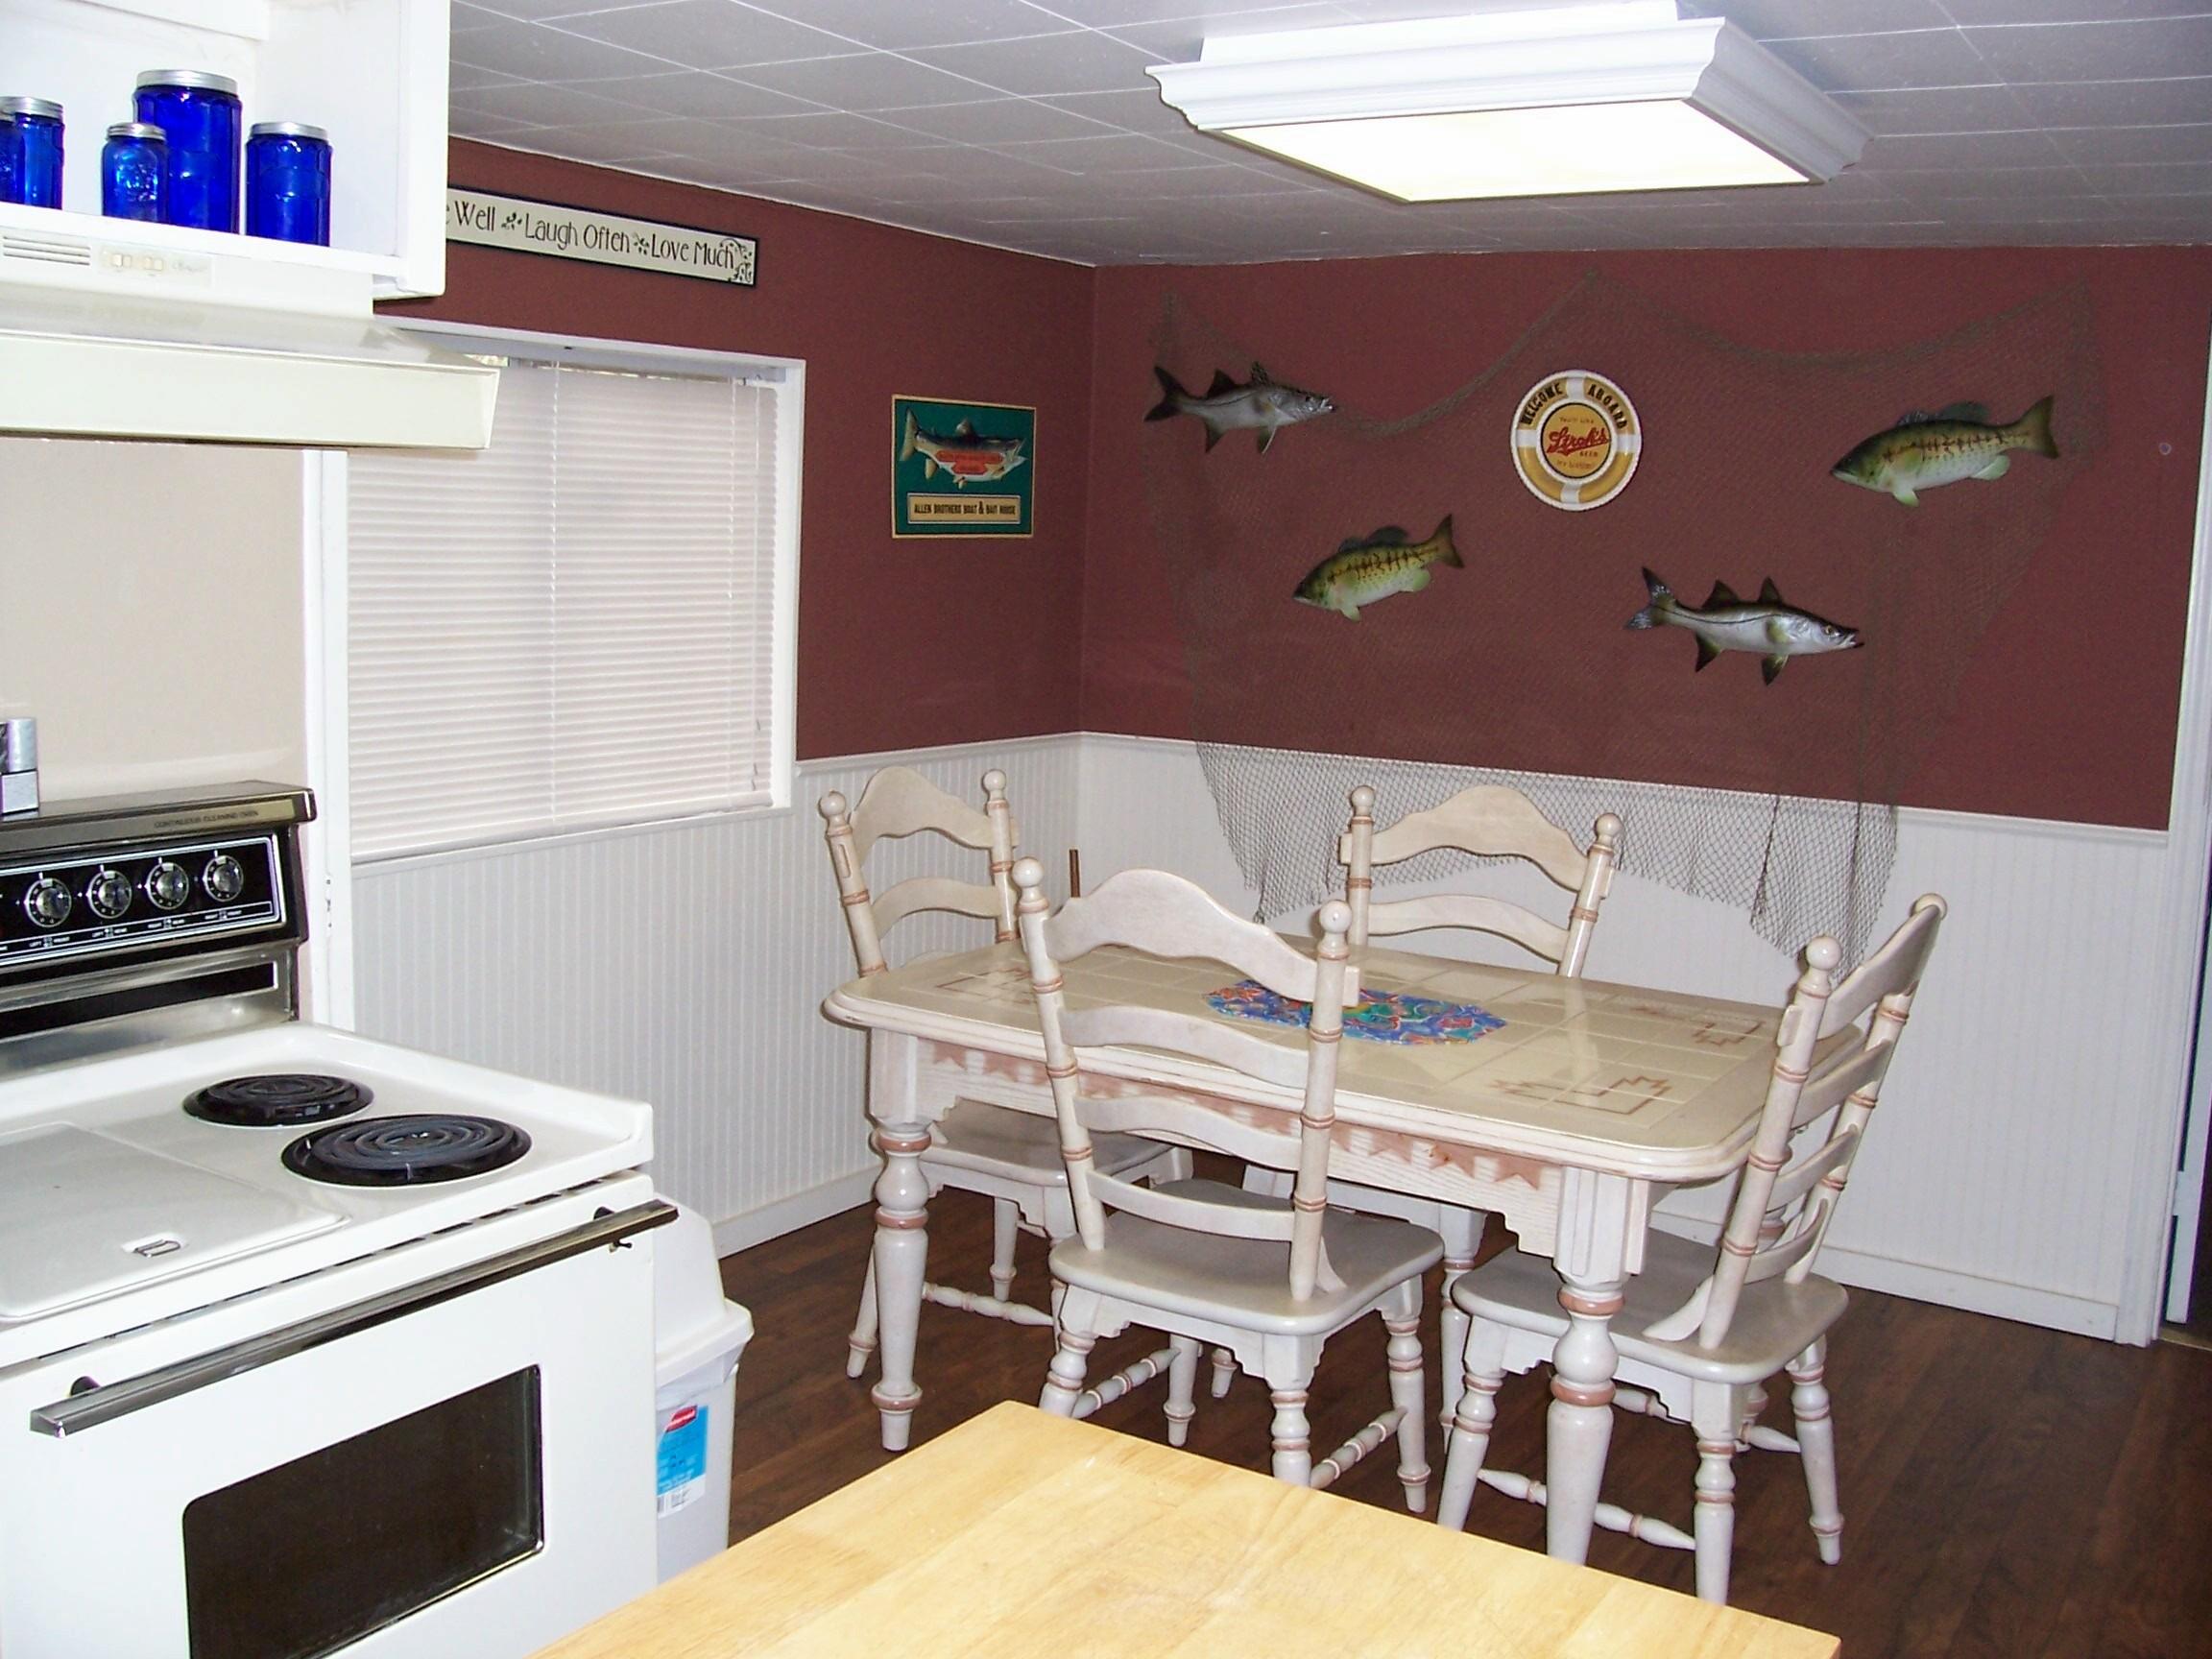 Nice_breakfast_area_in_kitchen